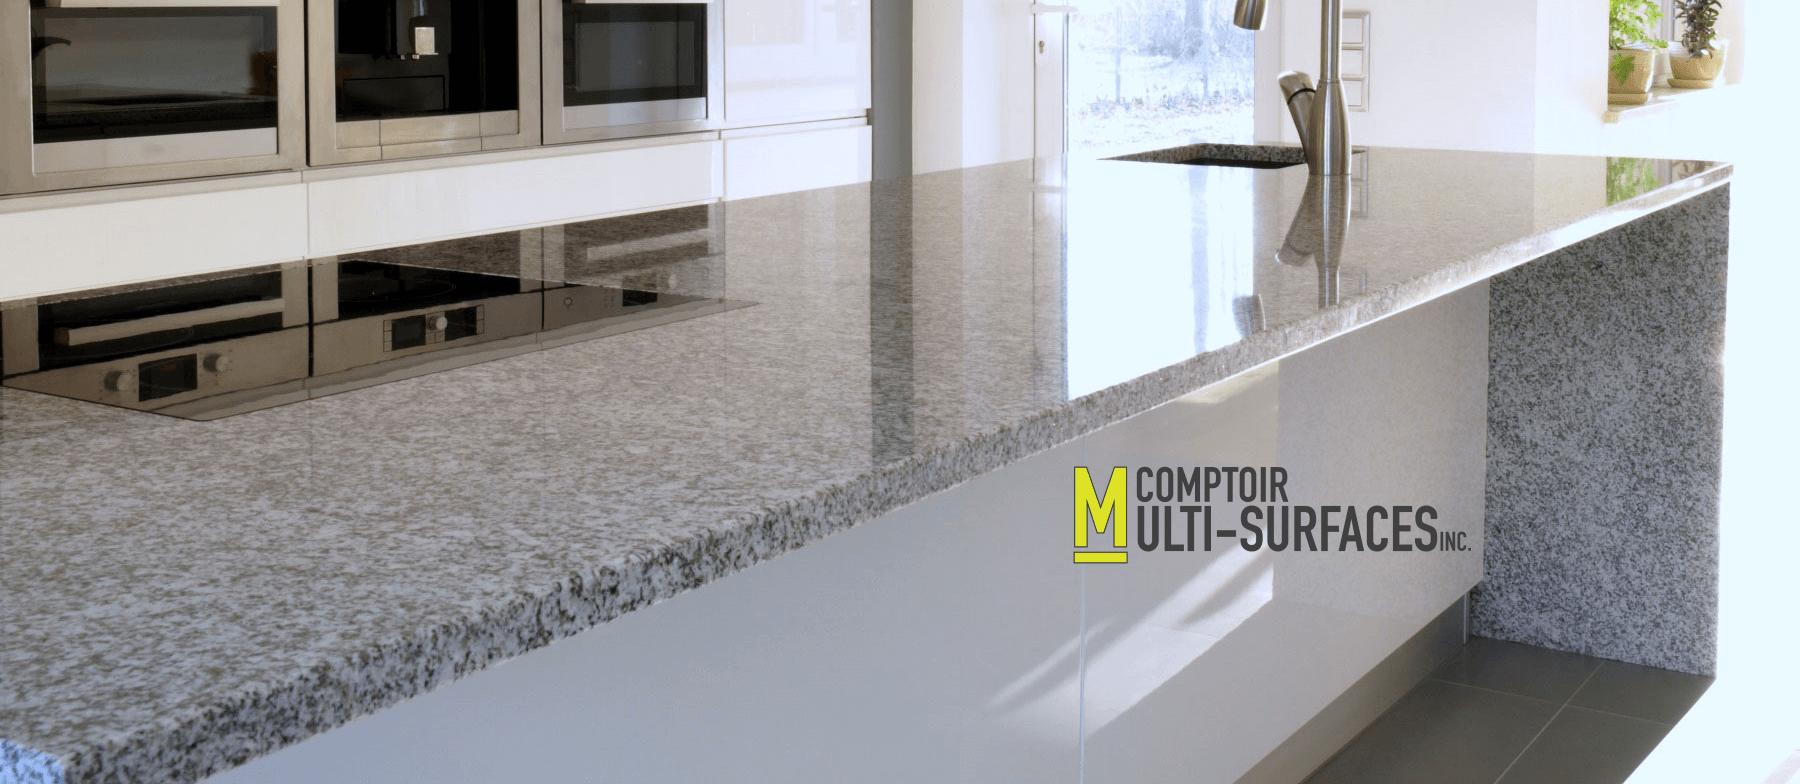 sp cialiste r paration de comptoirs de quartz de granit de marbre de corian comptoir multi. Black Bedroom Furniture Sets. Home Design Ideas